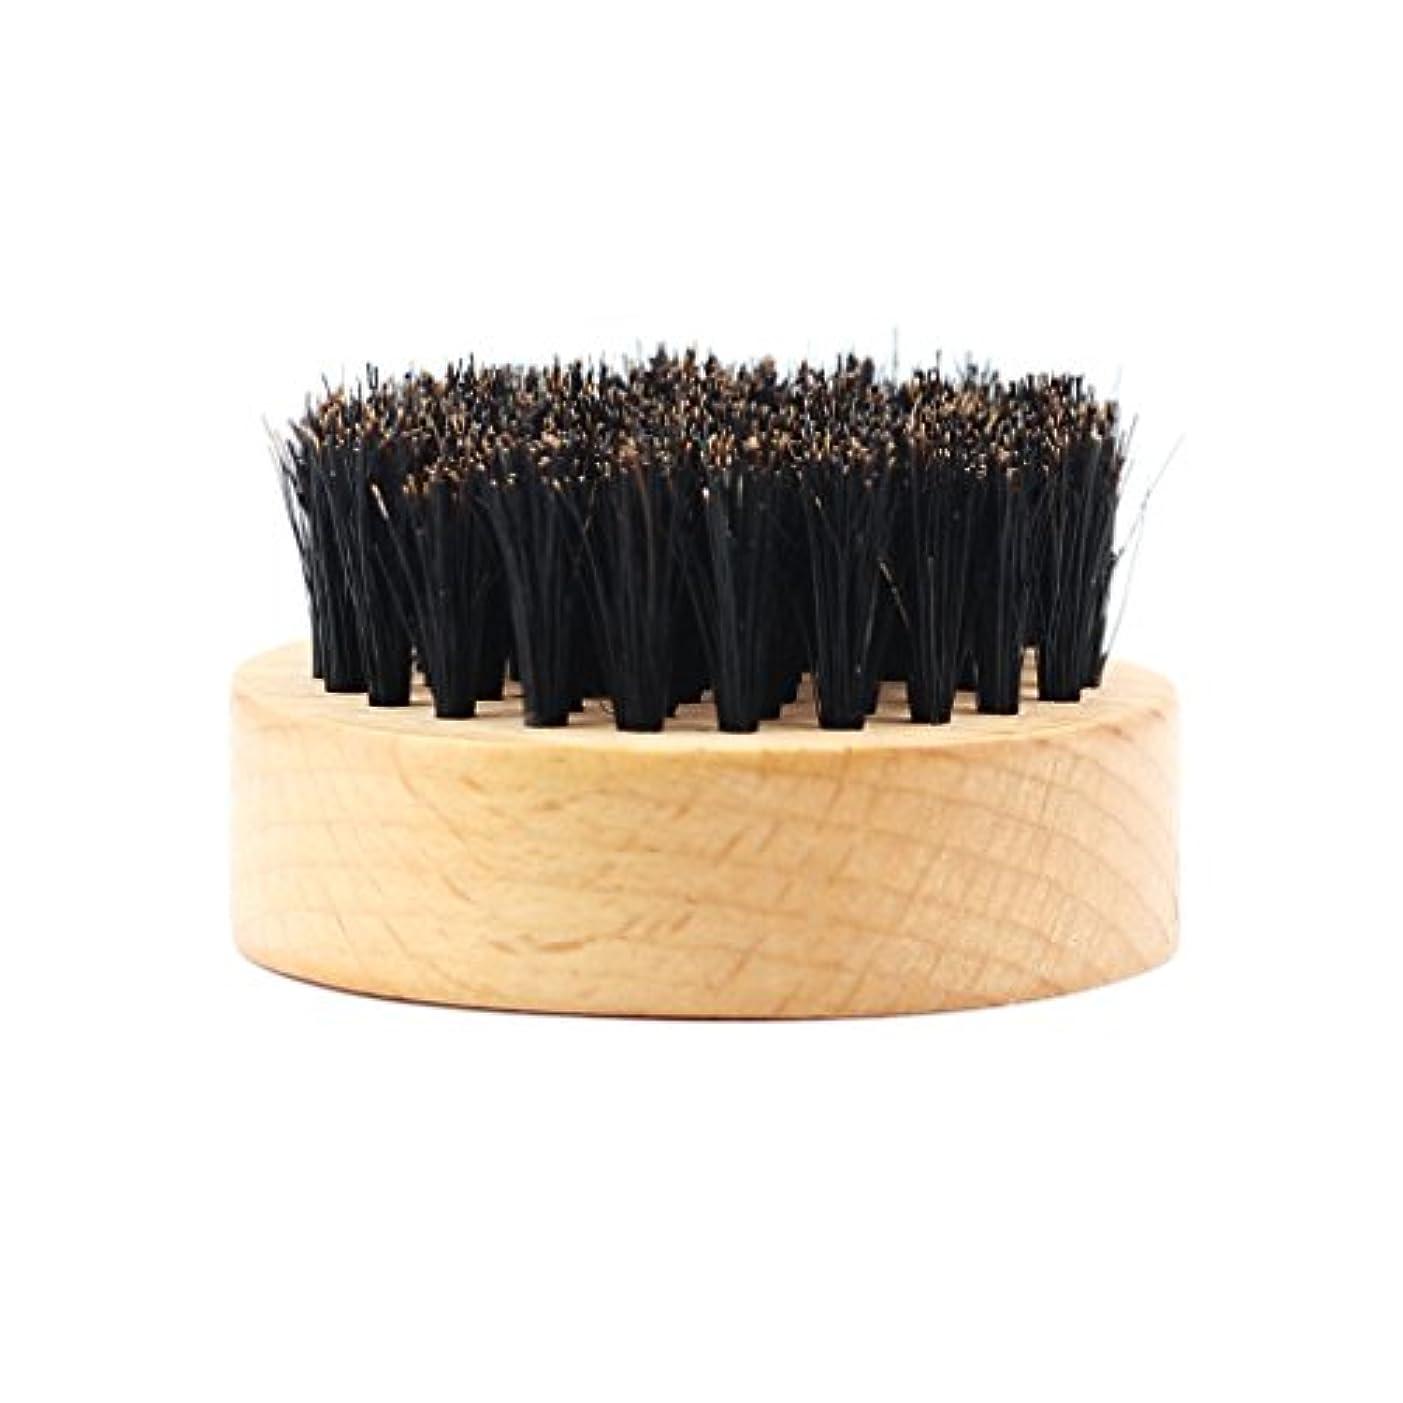 Homyl 髭ブラシ 男性 ひげ剃り 天然木ハンドル ひげそり グルーミング 2タイプ選べる - #2